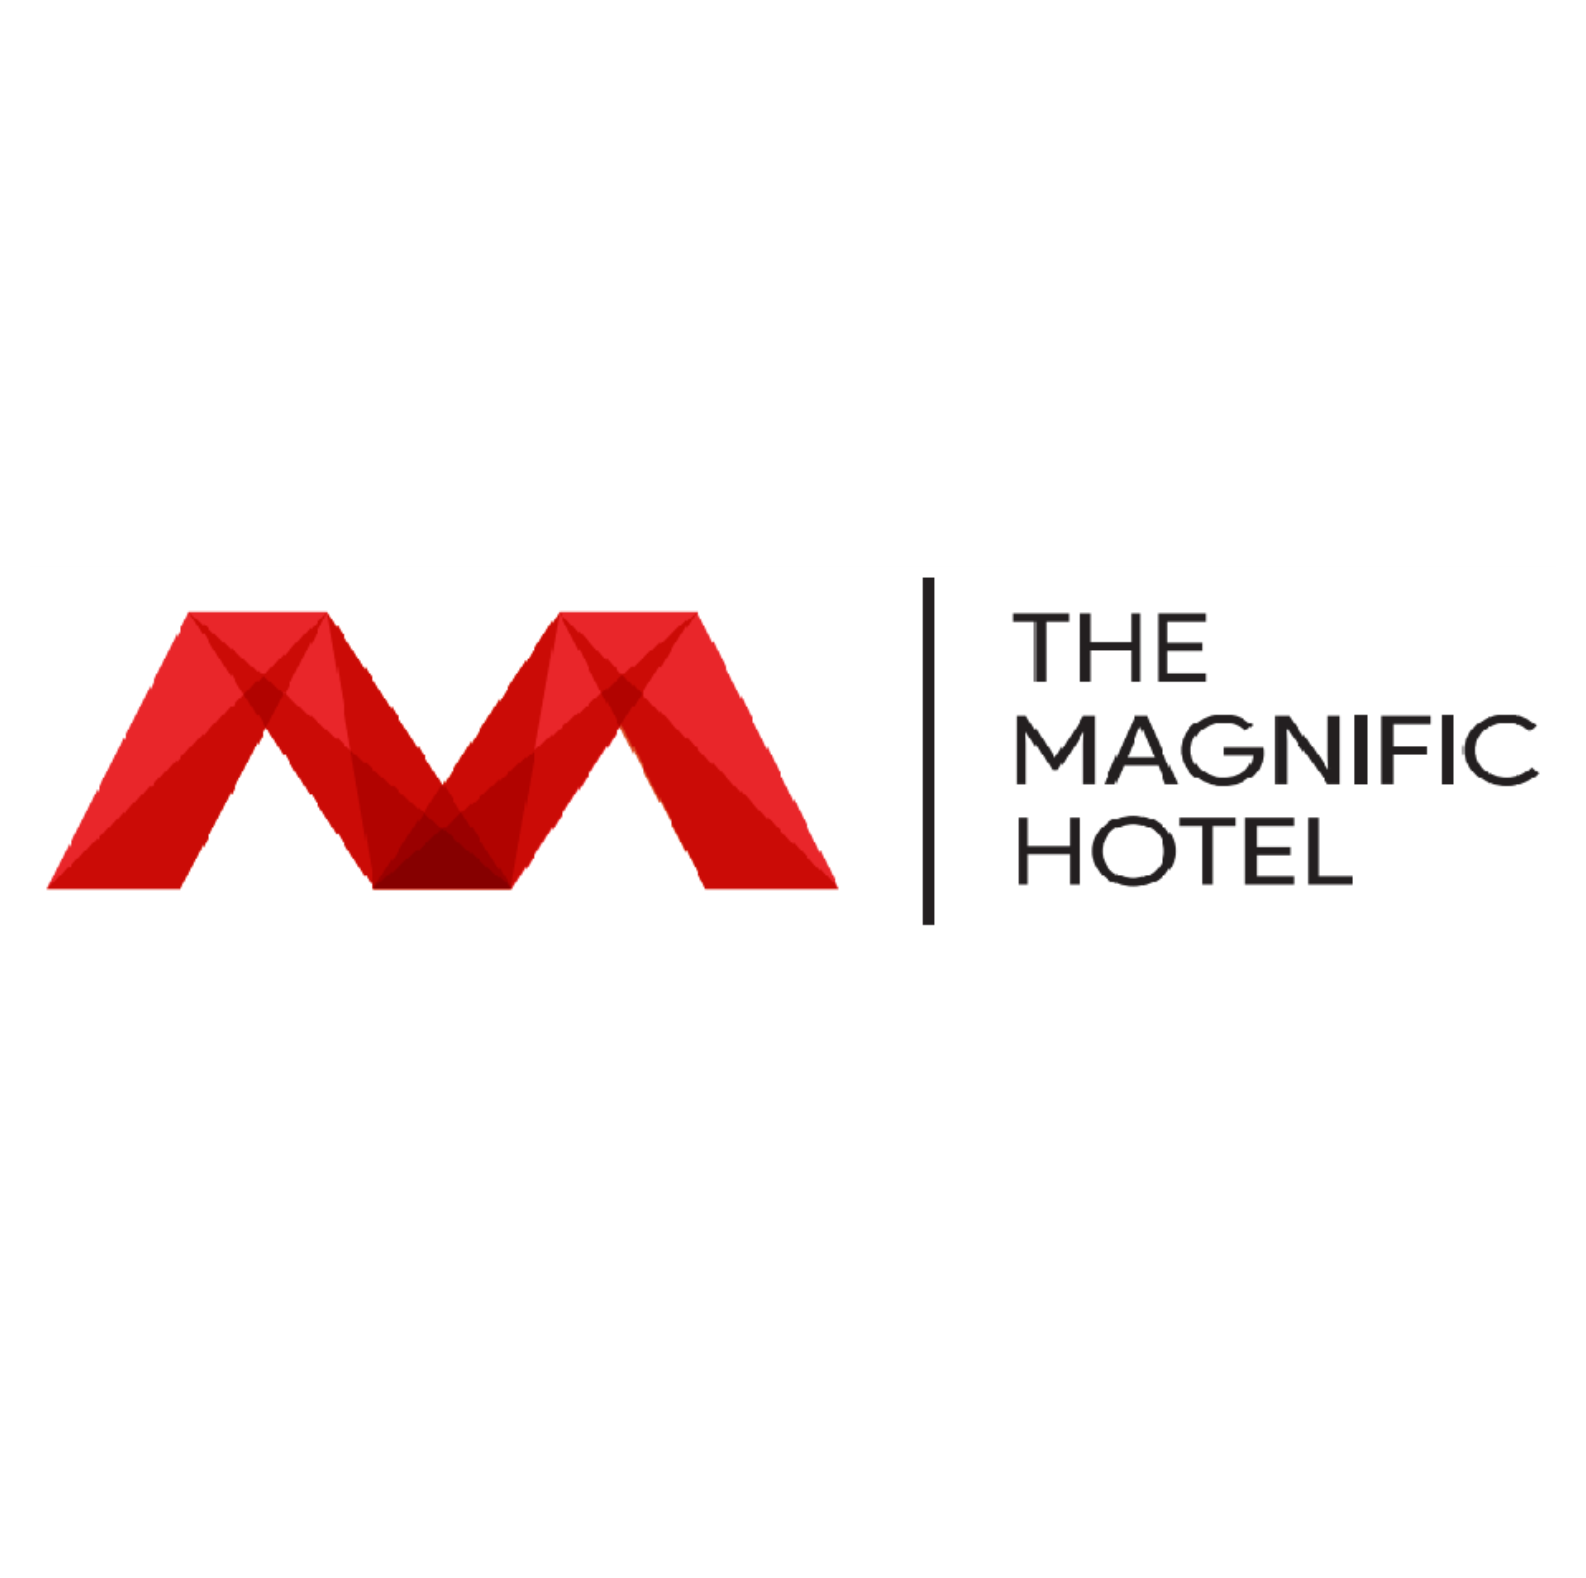 THE MAGNIFIC HOTEL